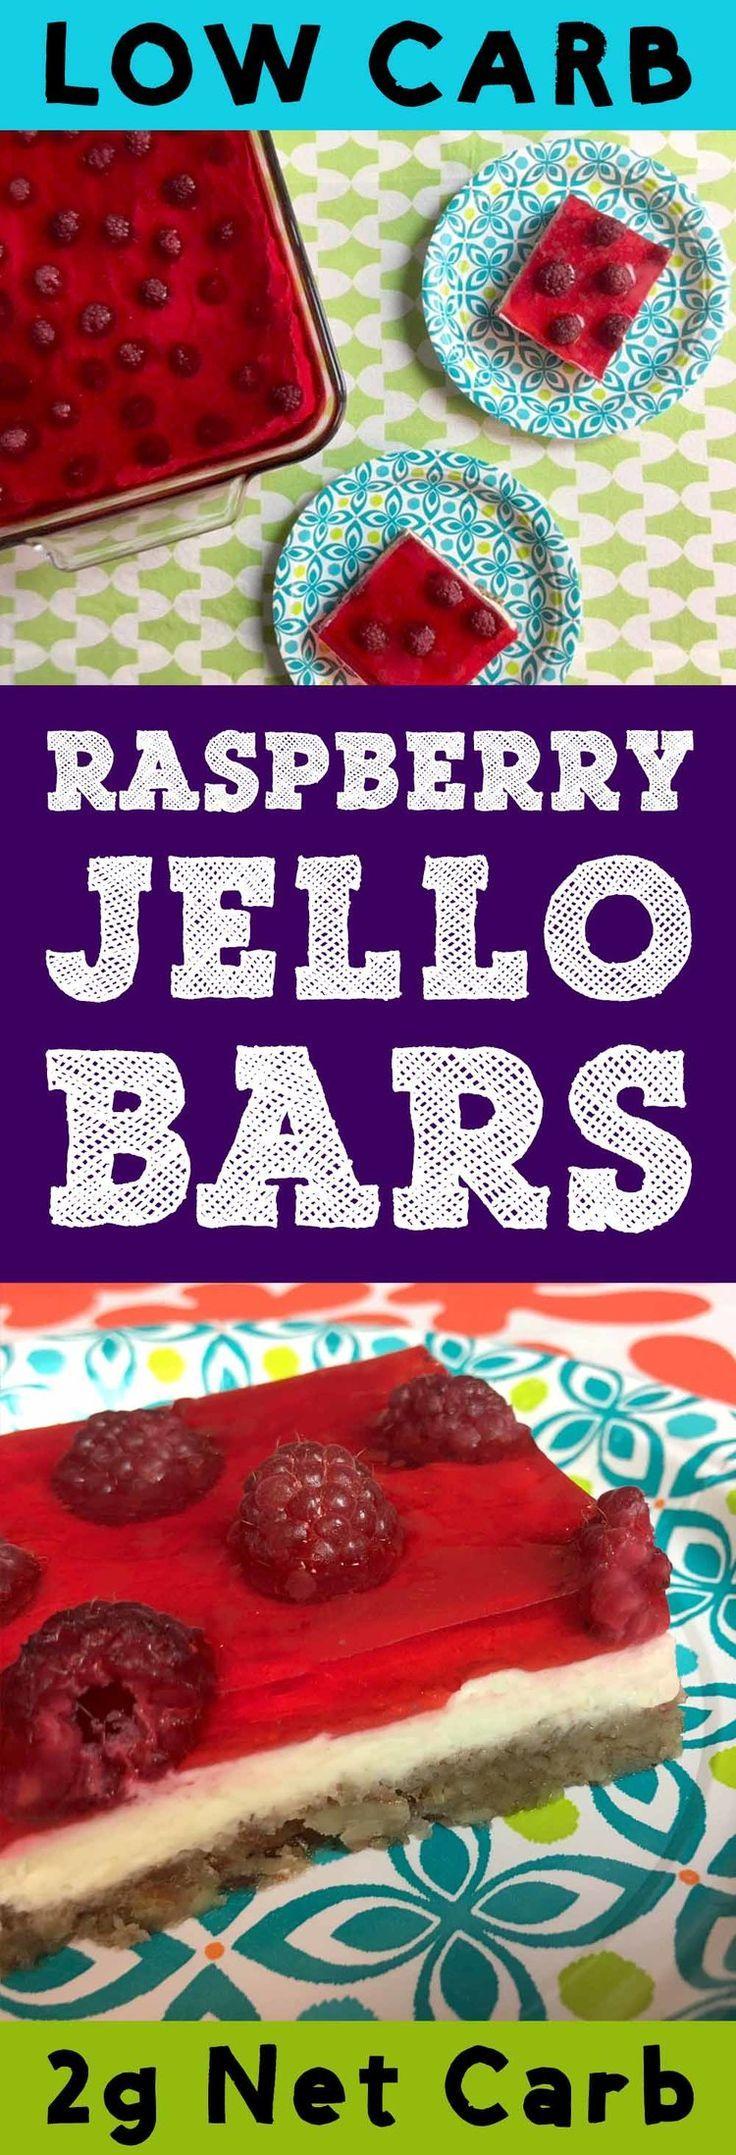 Low carb raspberry cheesecake Jello bars